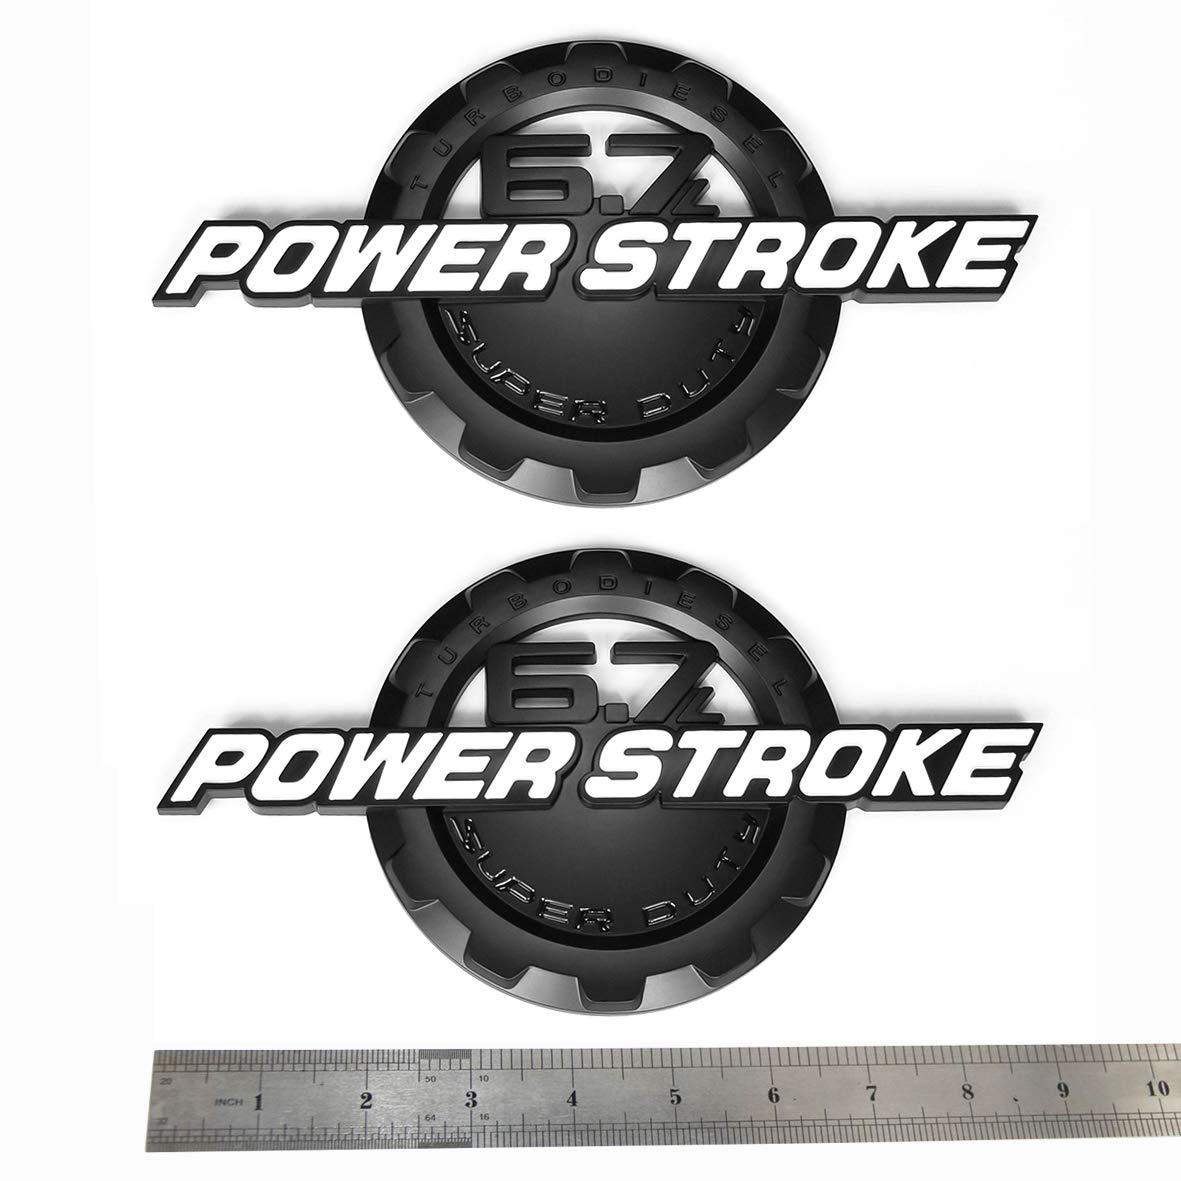 2x OEM Black 6.7L POWER STROKE SUPER DUTY Side Fender Emblems Badge Powerstroke 3D logo Replacement for F250 F350 White Sanucaraofo